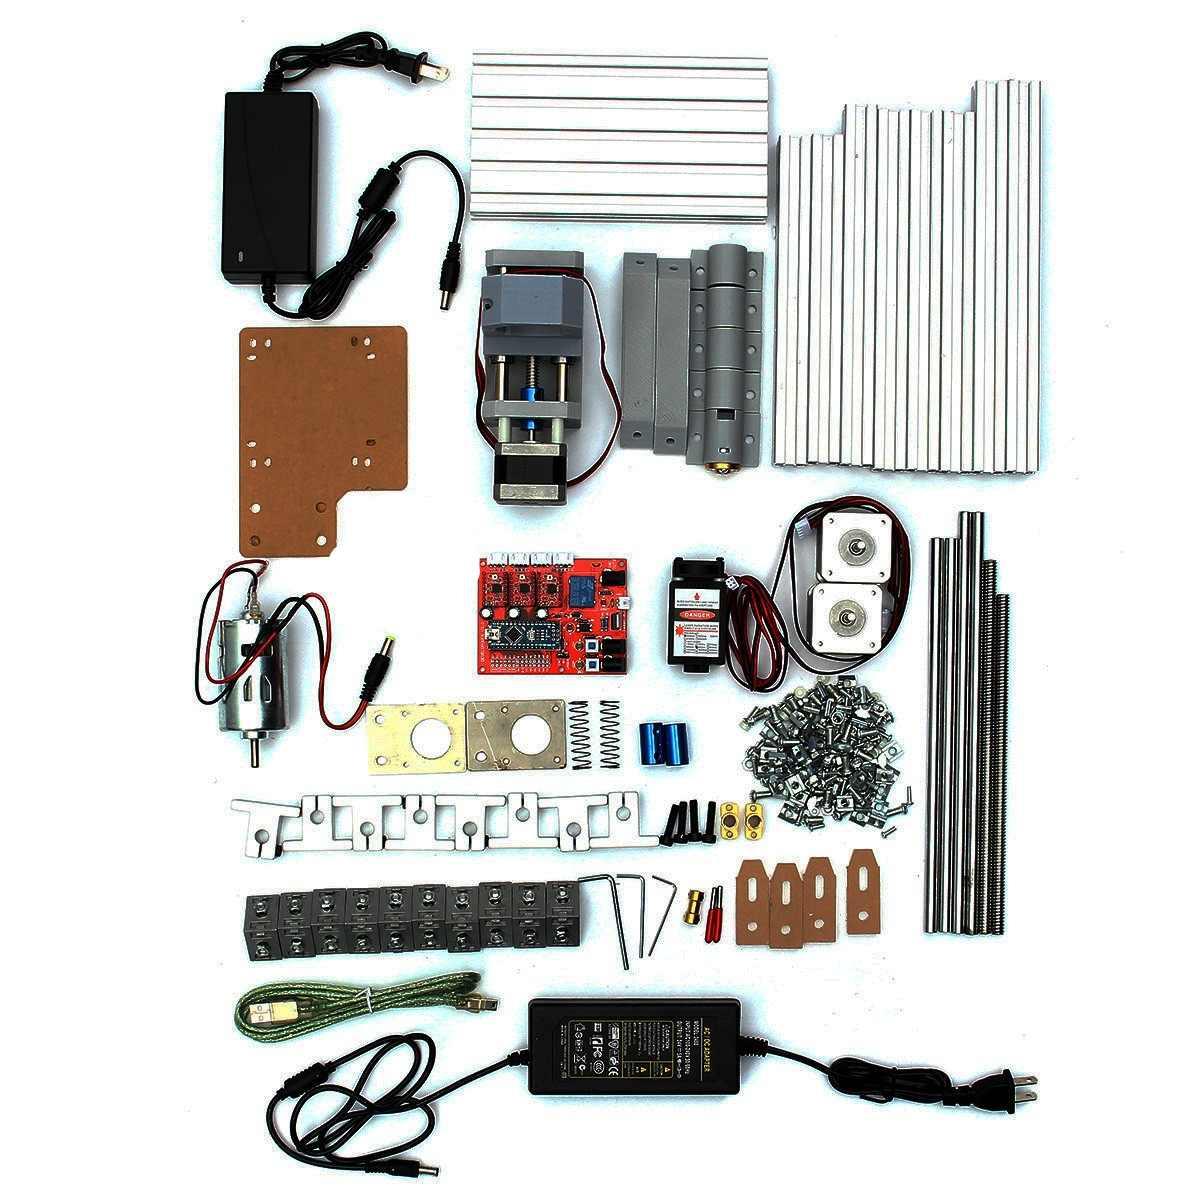 Mini 3 grabador láser máquina cc 12V DIY cortador de madera de escritorio/impresora/potencia ajustable con cabezal láser de 500MW - 3